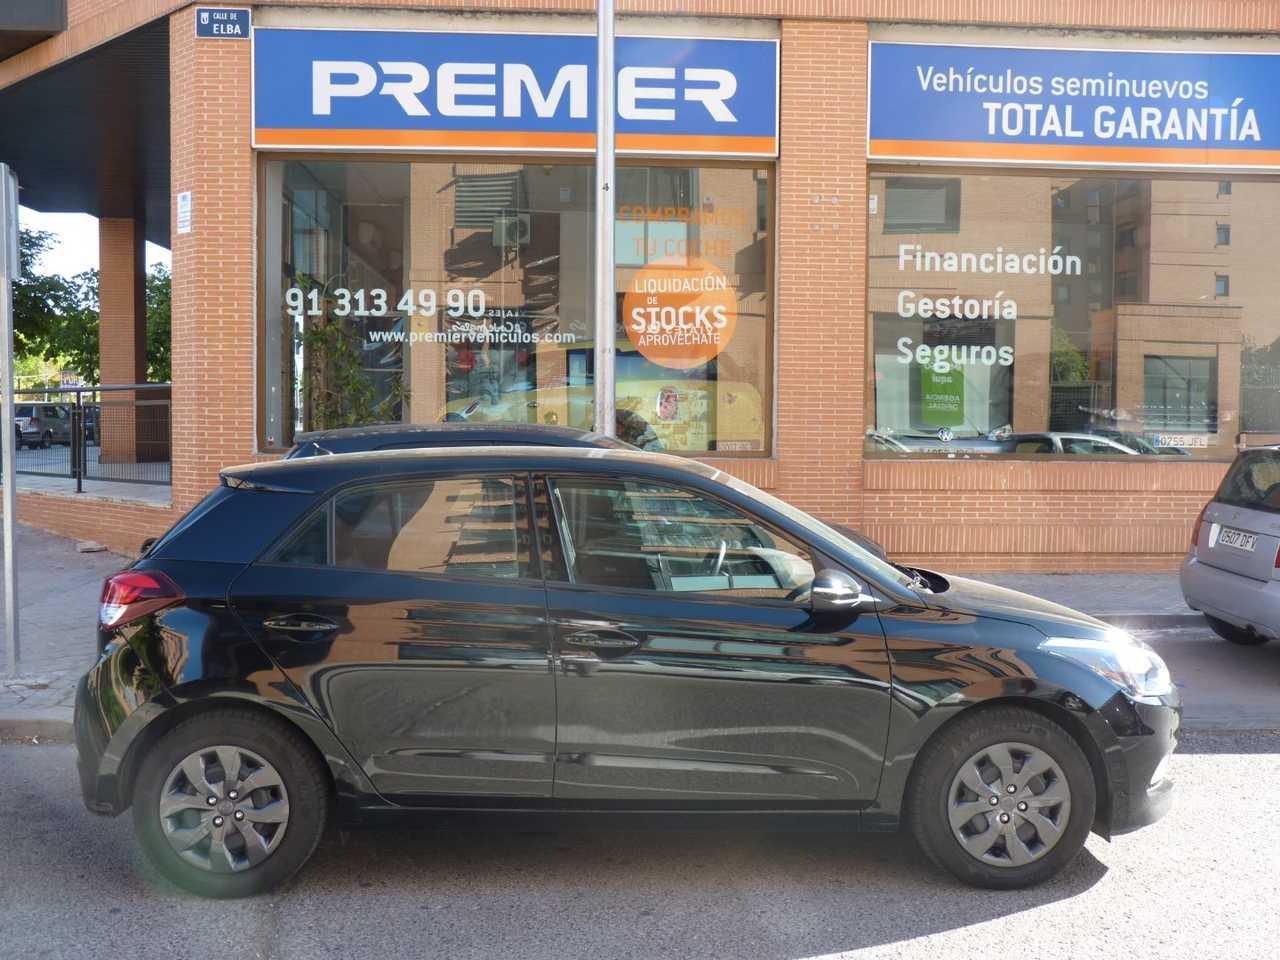 Hyundai i20 1.2 MPI  25 Aniversario  - Foto 1